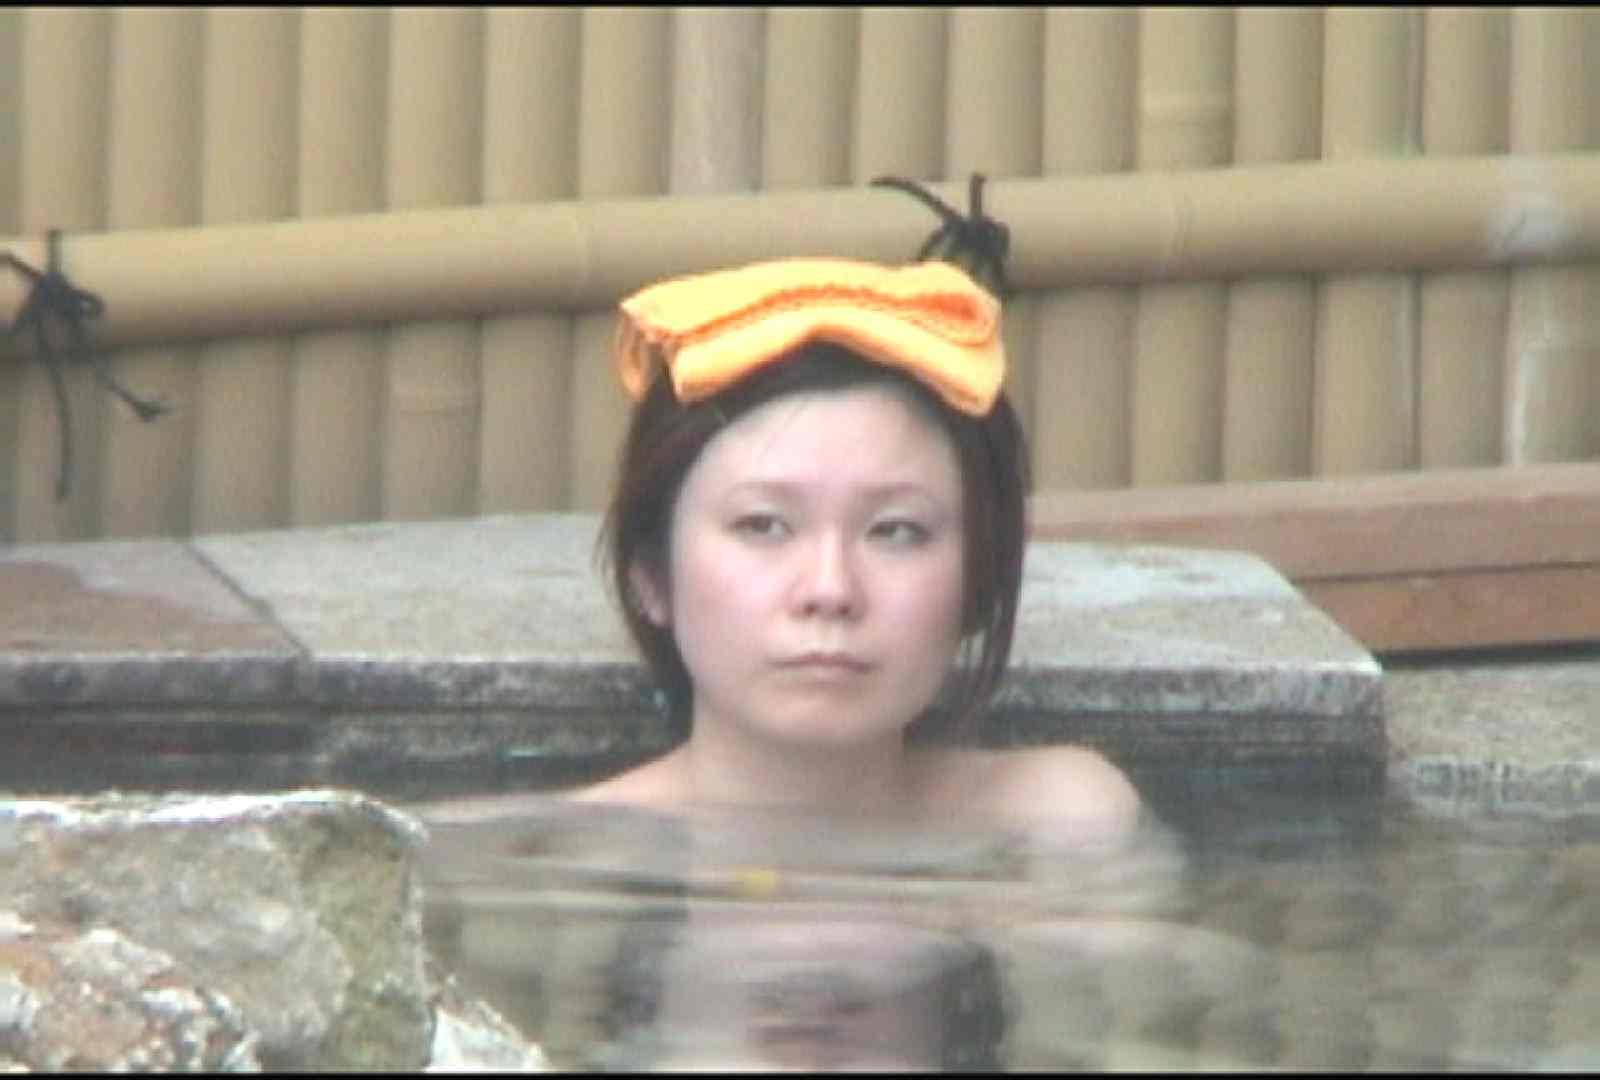 Aquaな露天風呂Vol.177 盗撮師作品  102pic 18